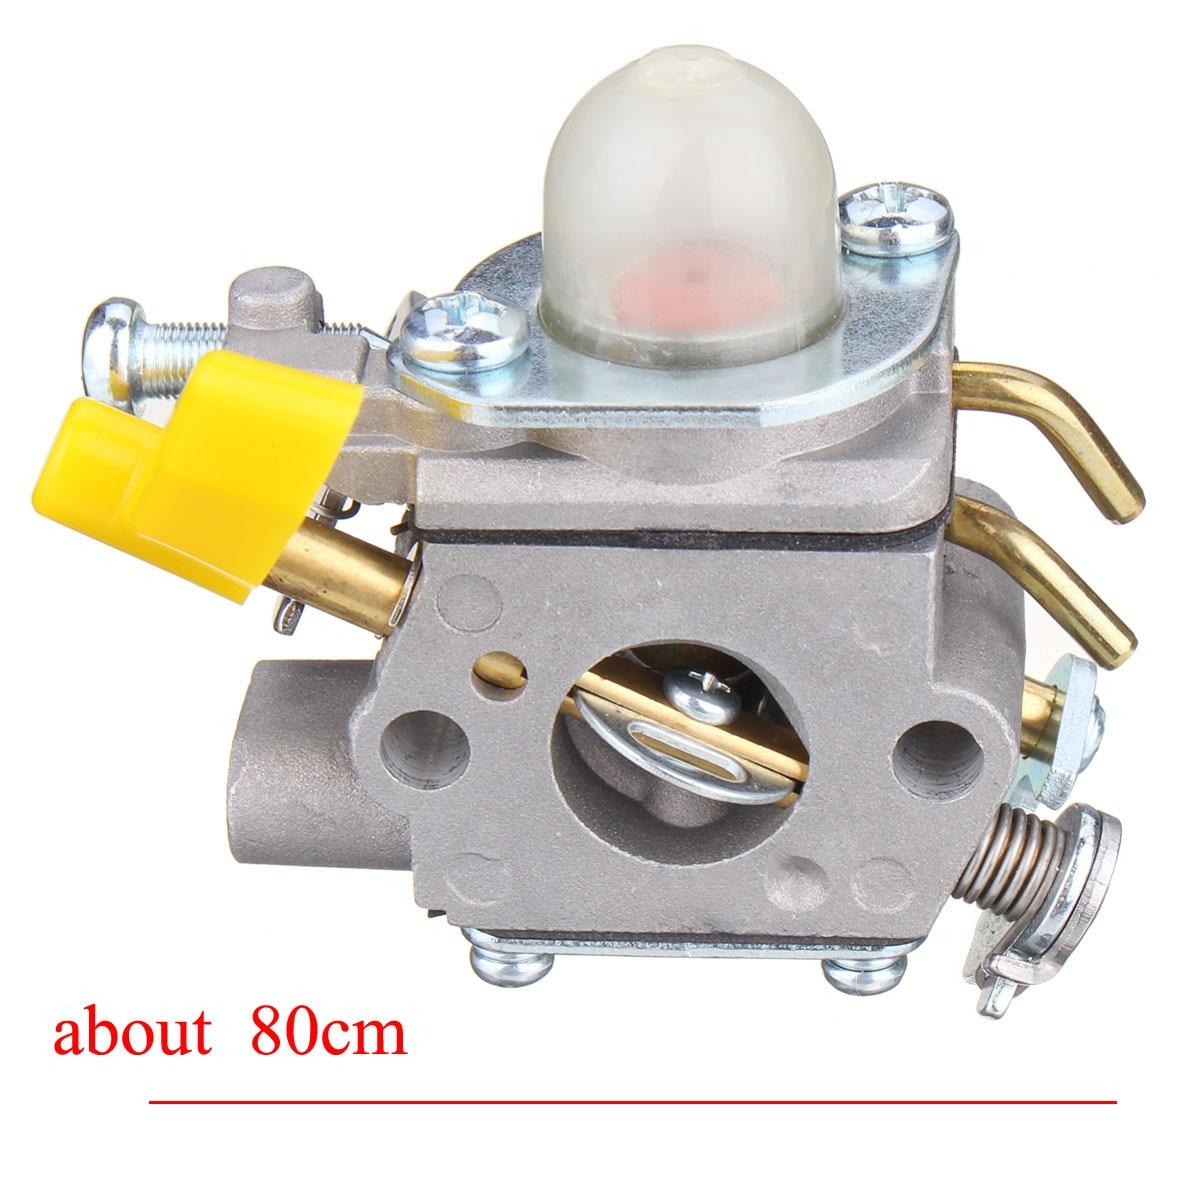 Carburetor Replacement Kit With Fuel Filter Oil Tube Primer Bulb for Ryobi  for Homelite UT 60526 Gas Tiller/Cultivator-in Carburetors from Automobiles  ...